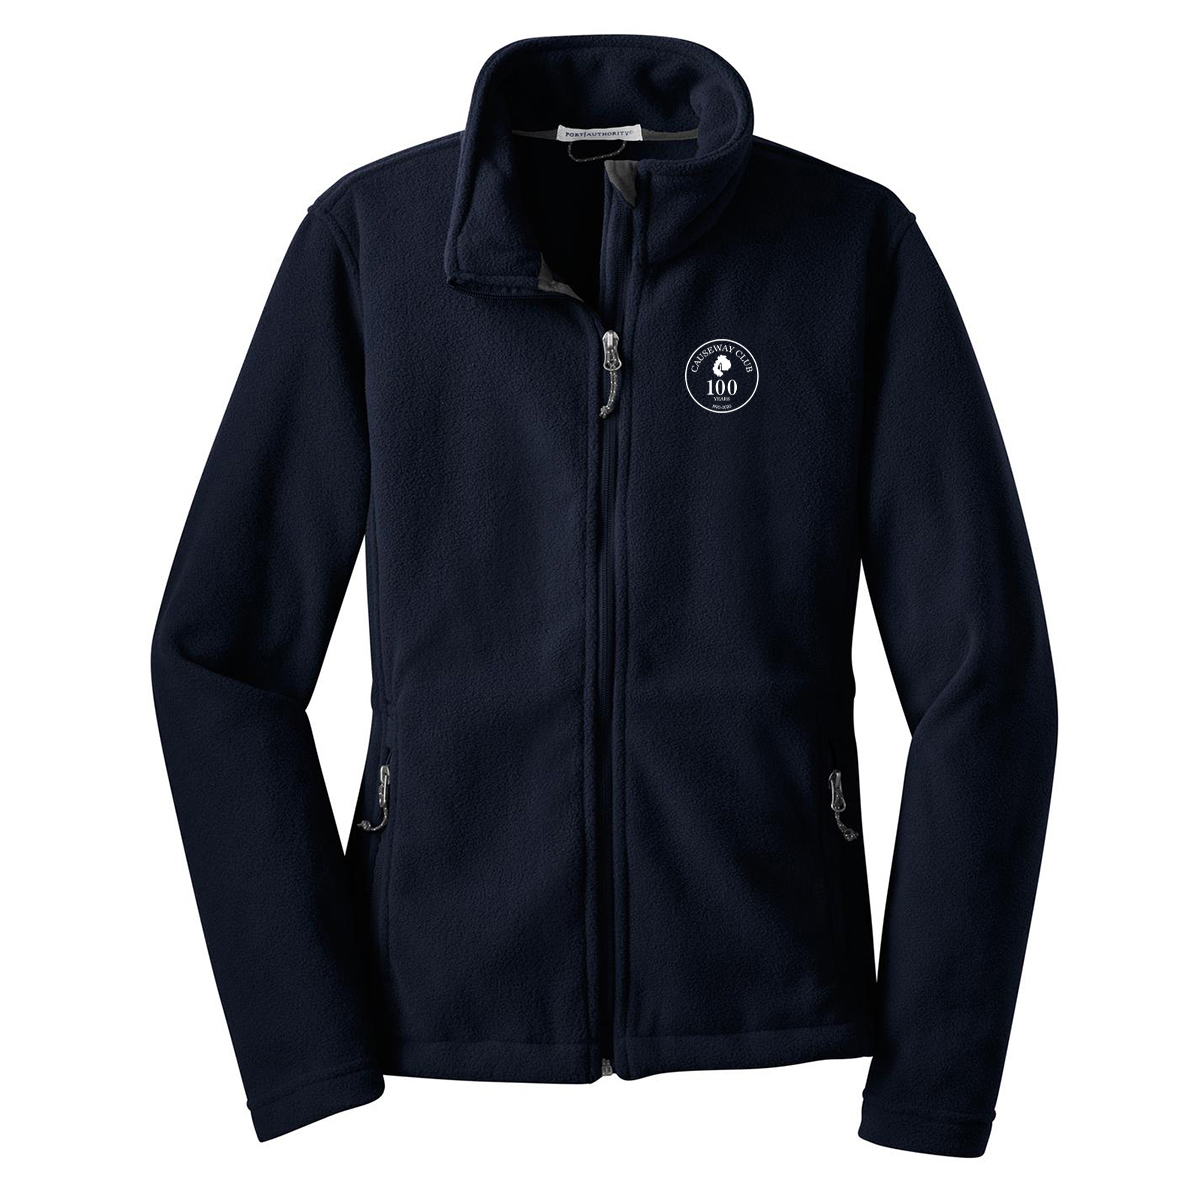 Causeway Club - Women's Value Fleece Jacket